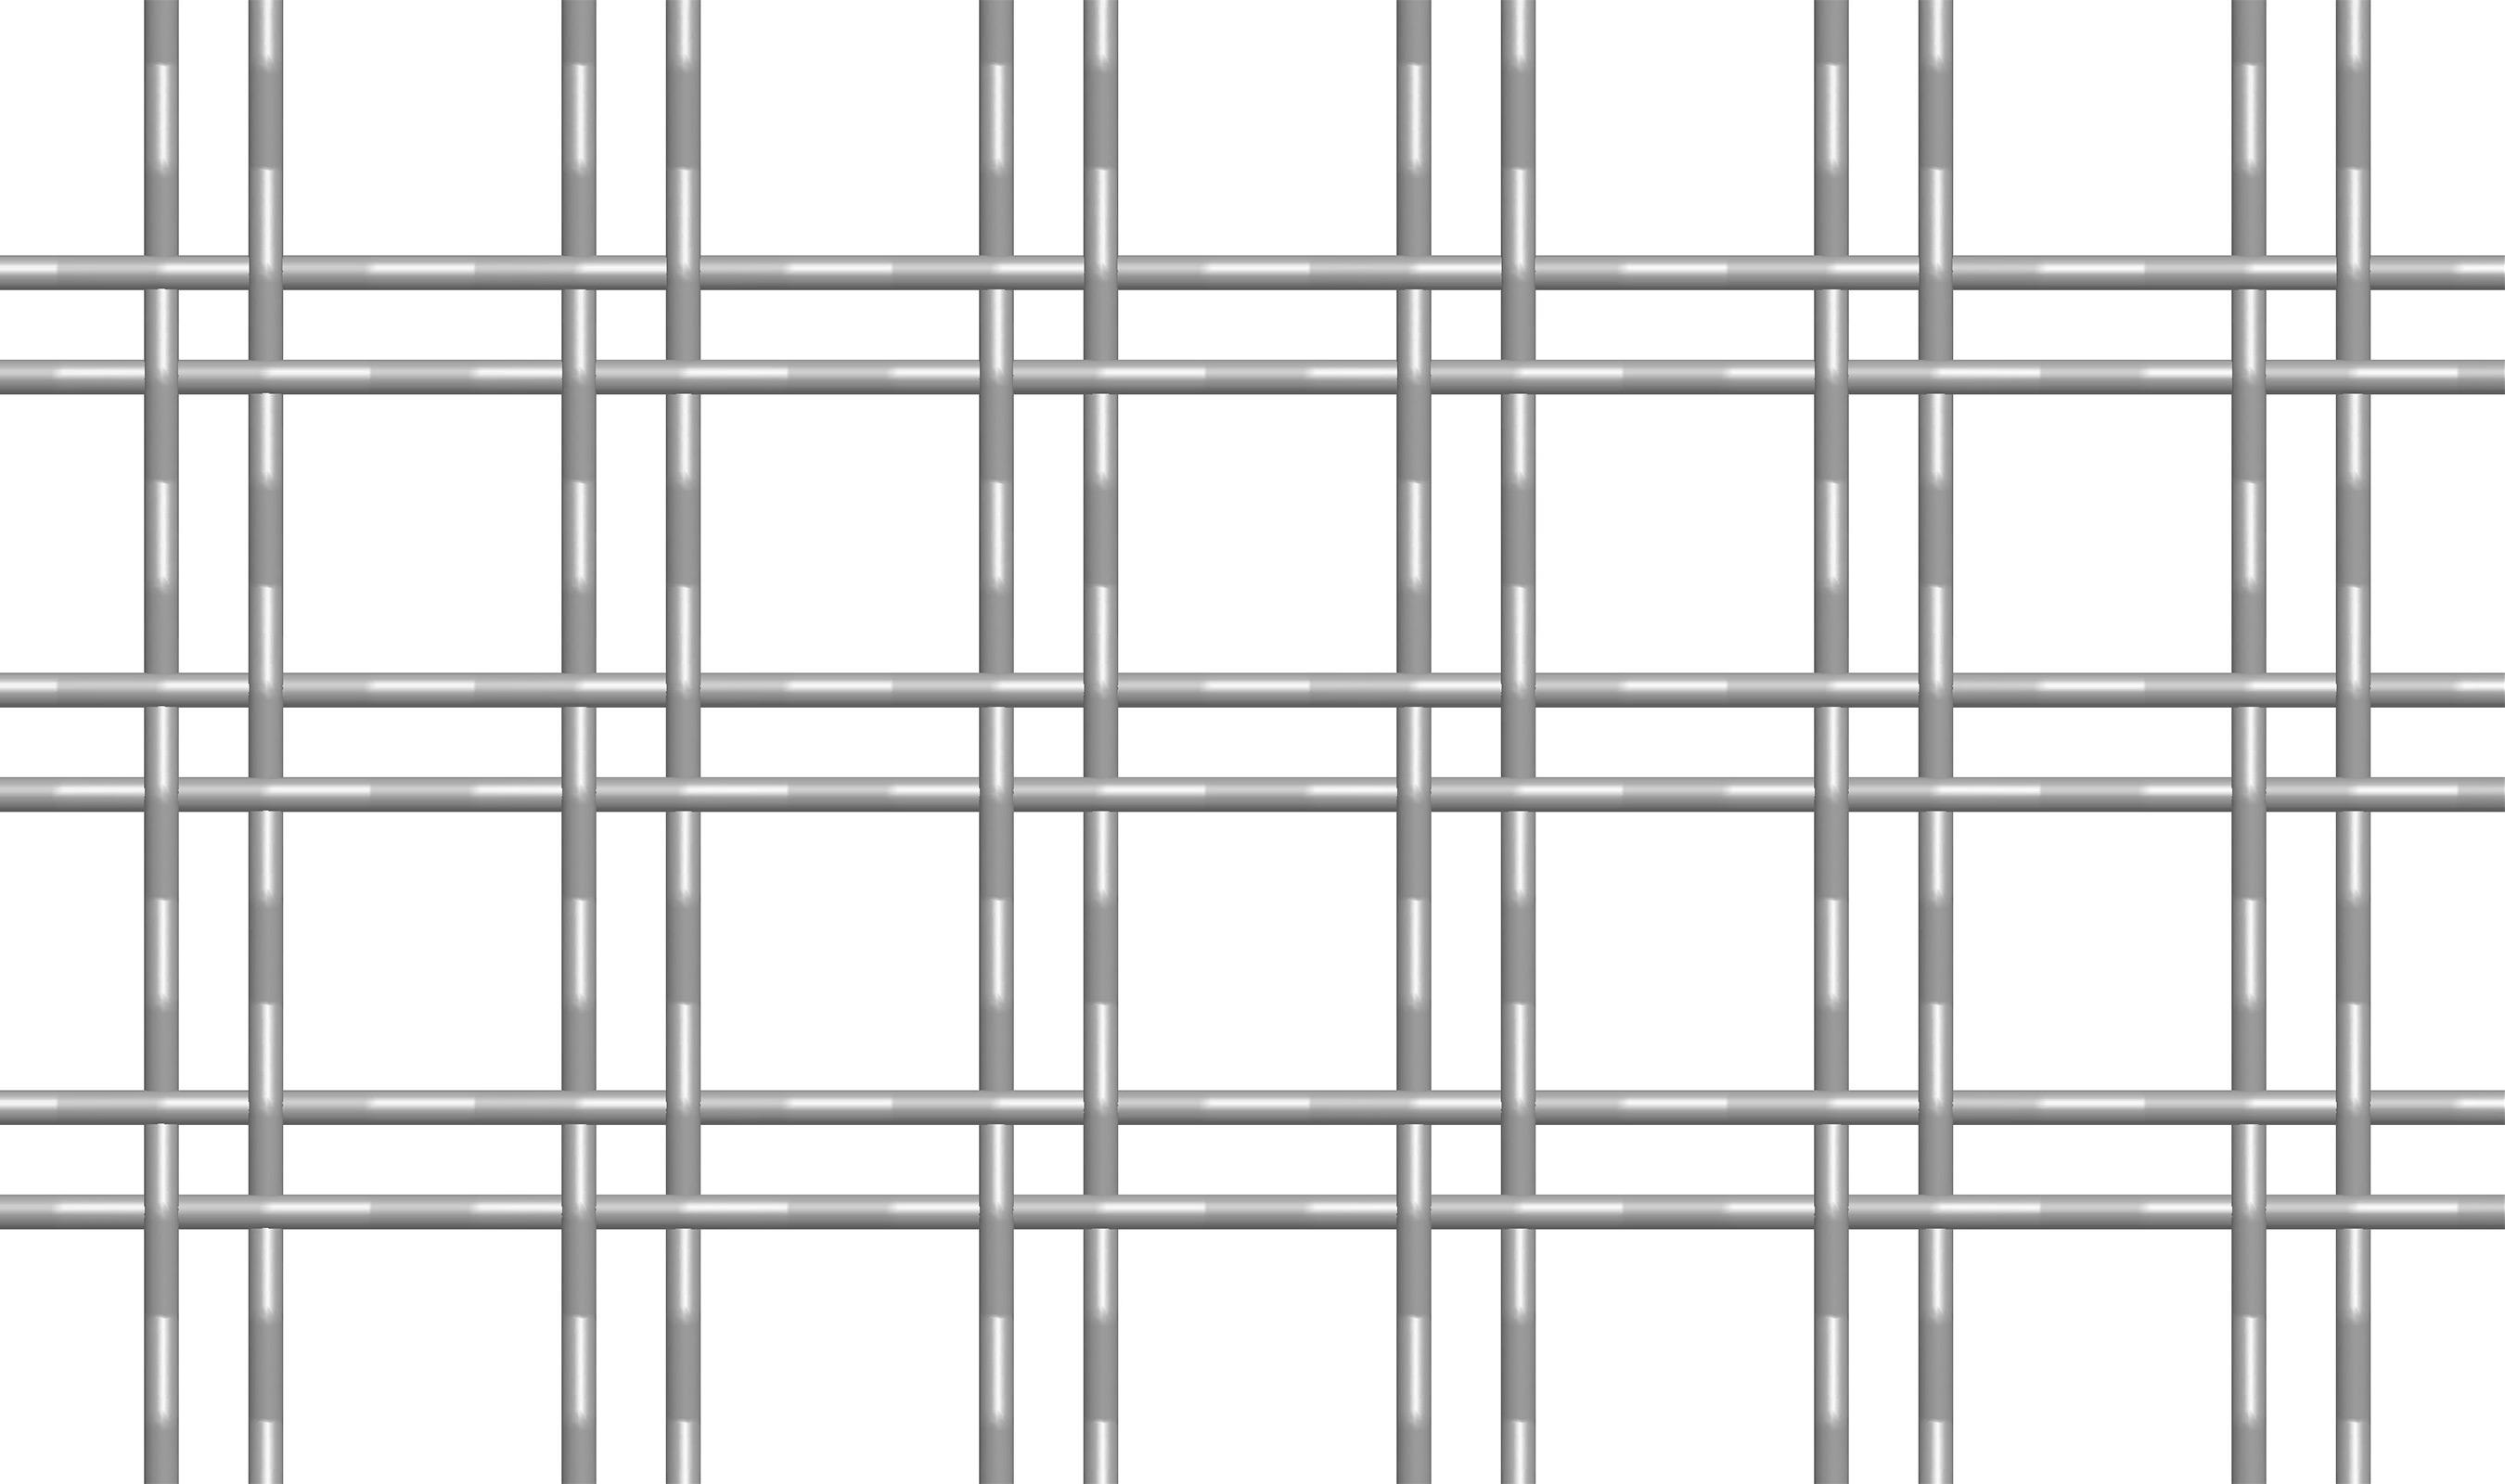 M22-1 twin wire intercrimp mesh pattern